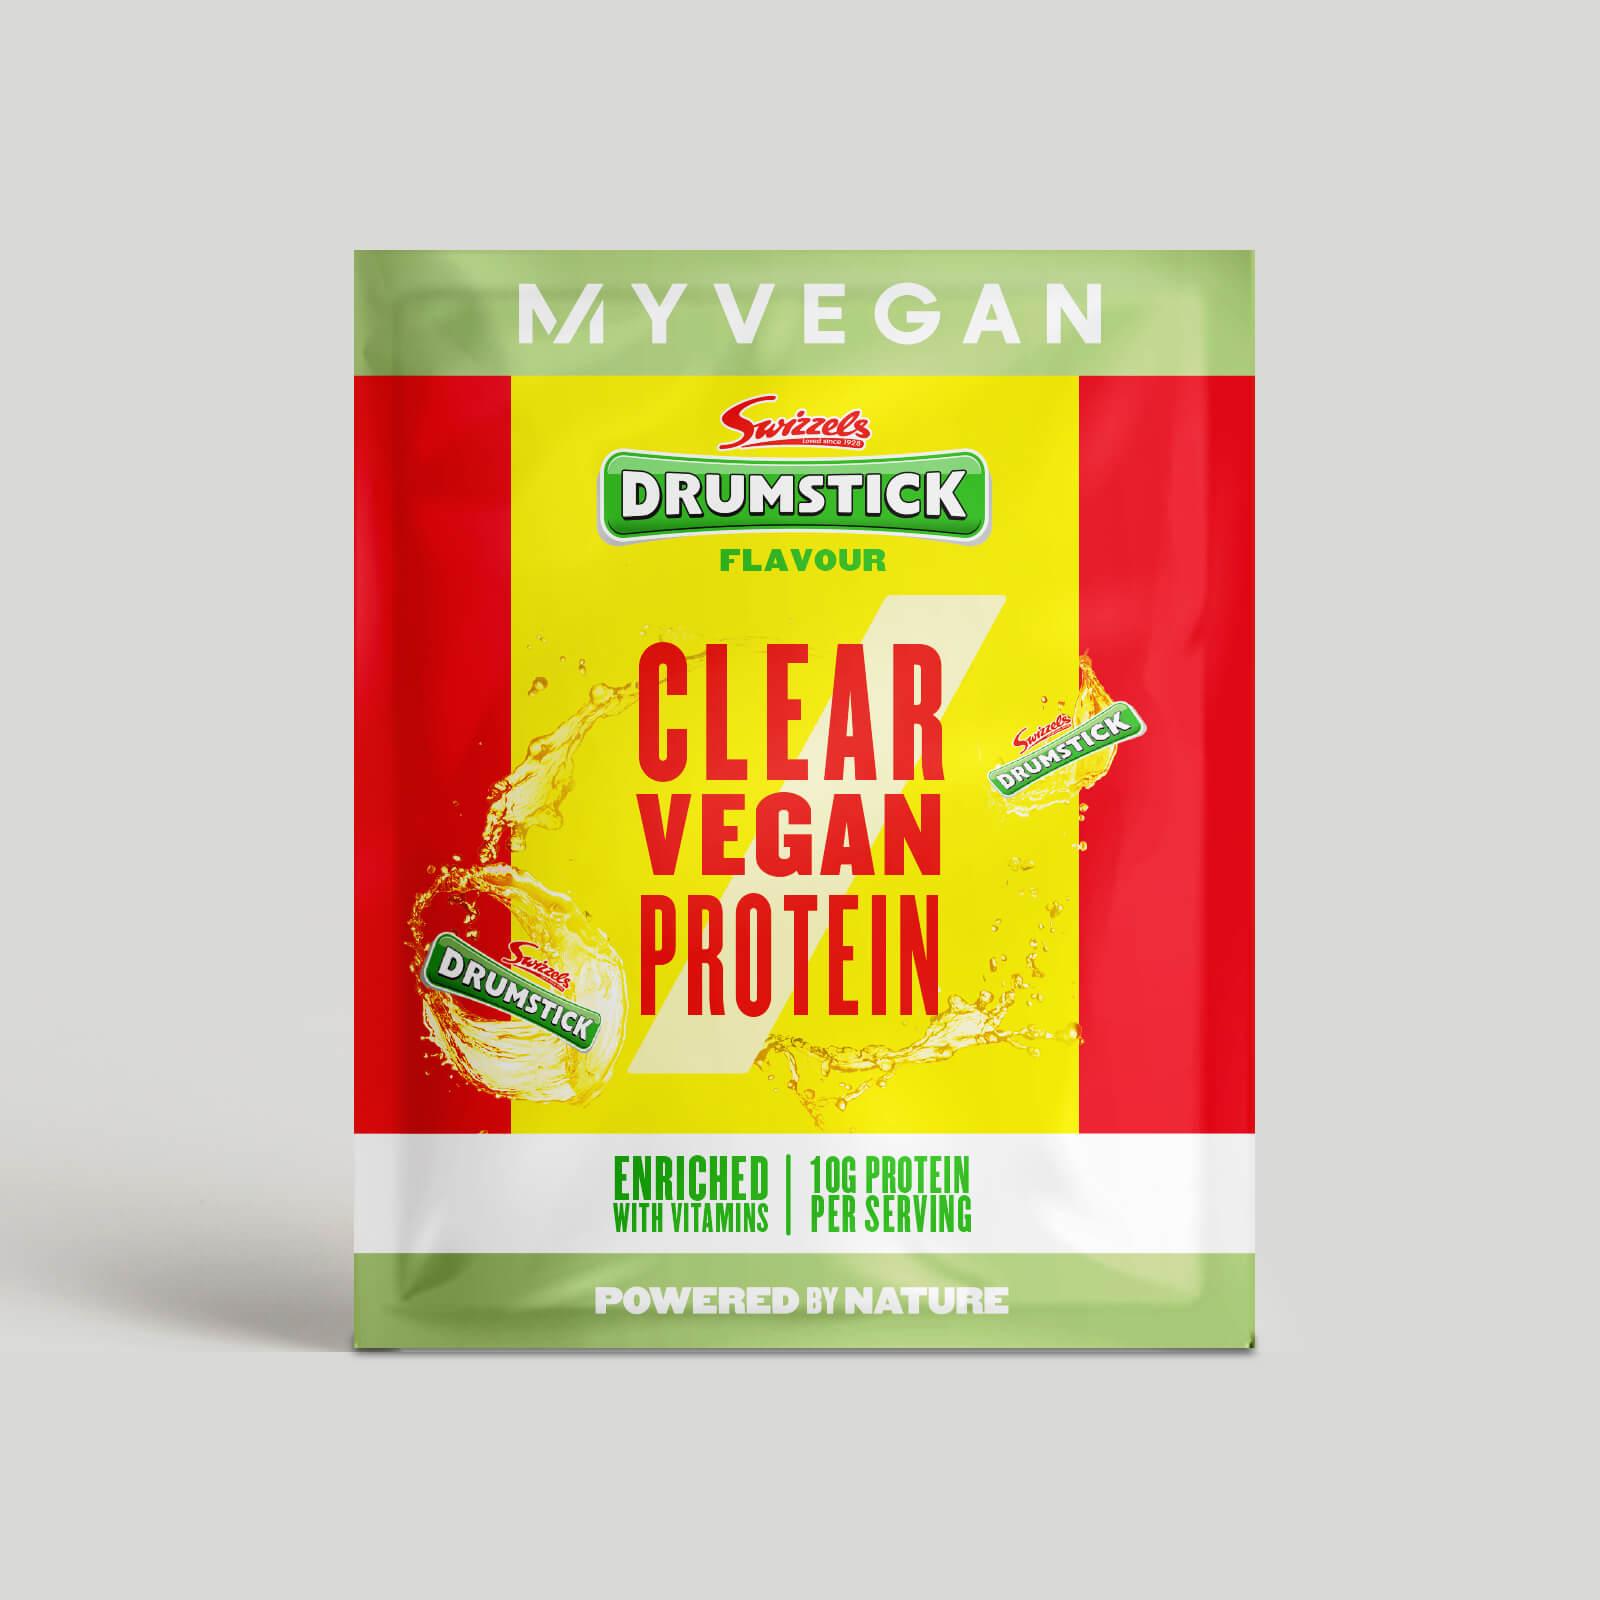 Myvegan Clear Vegan Protein, 16g (Sample) - Swizzels - Drumsticks